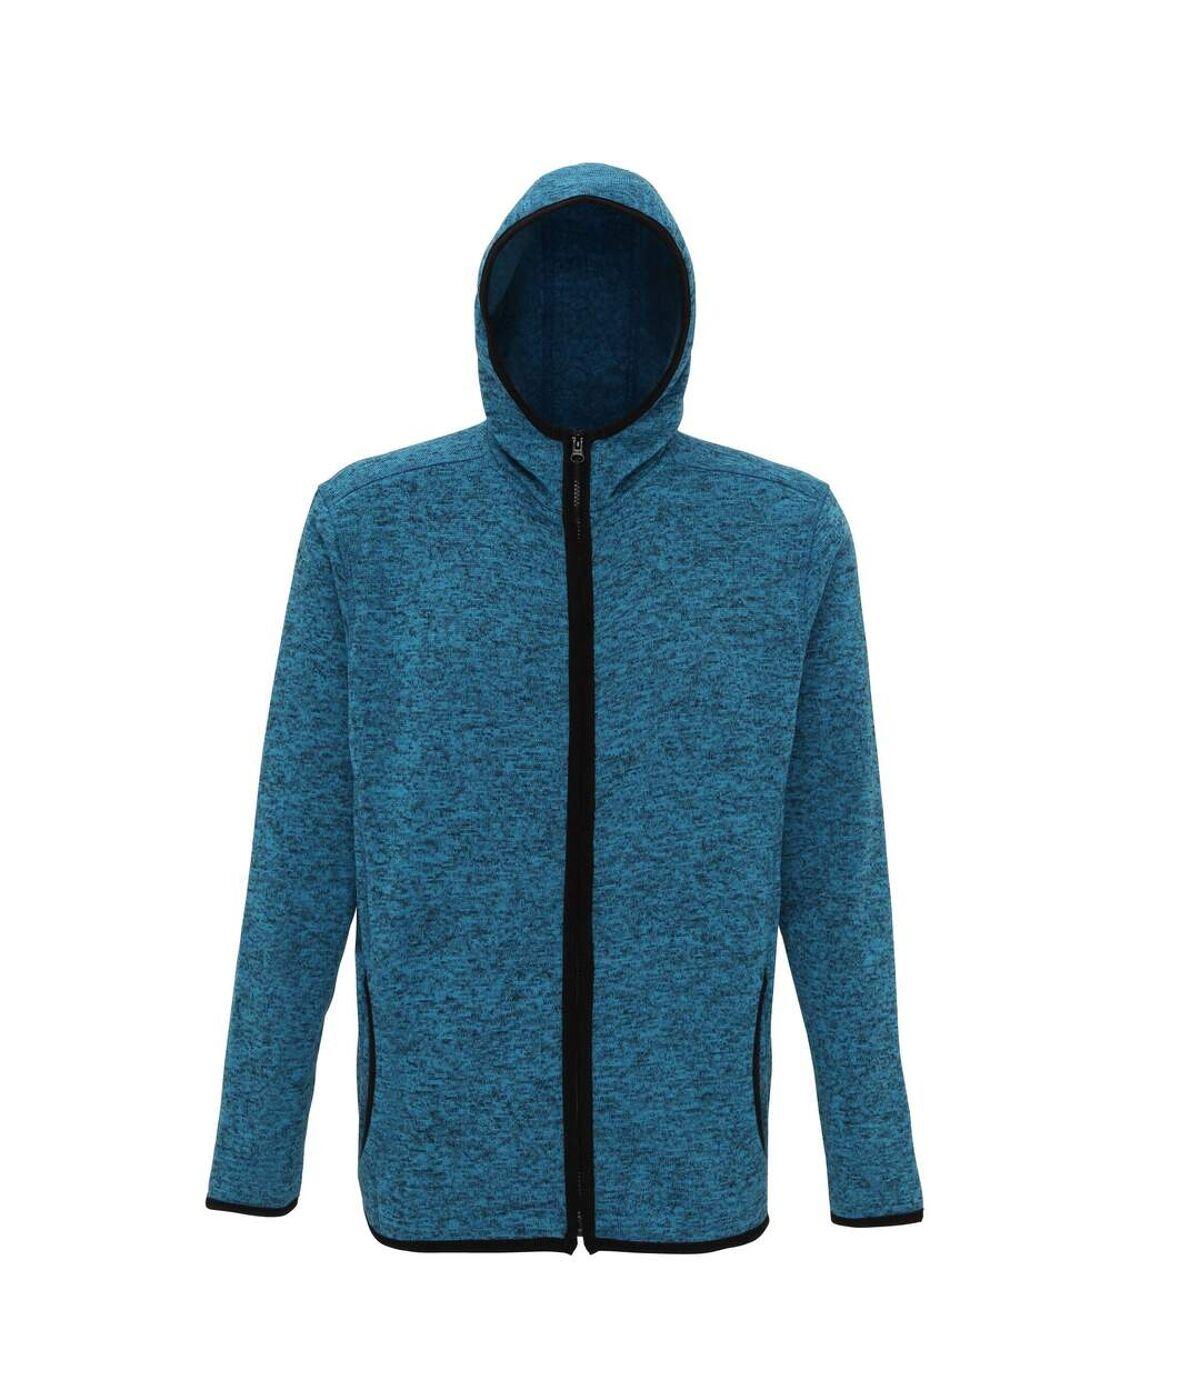 Tri Dri Mens Melange Knit Fleece Jacket (Sapphire/Black Fleck) - UTRW5459